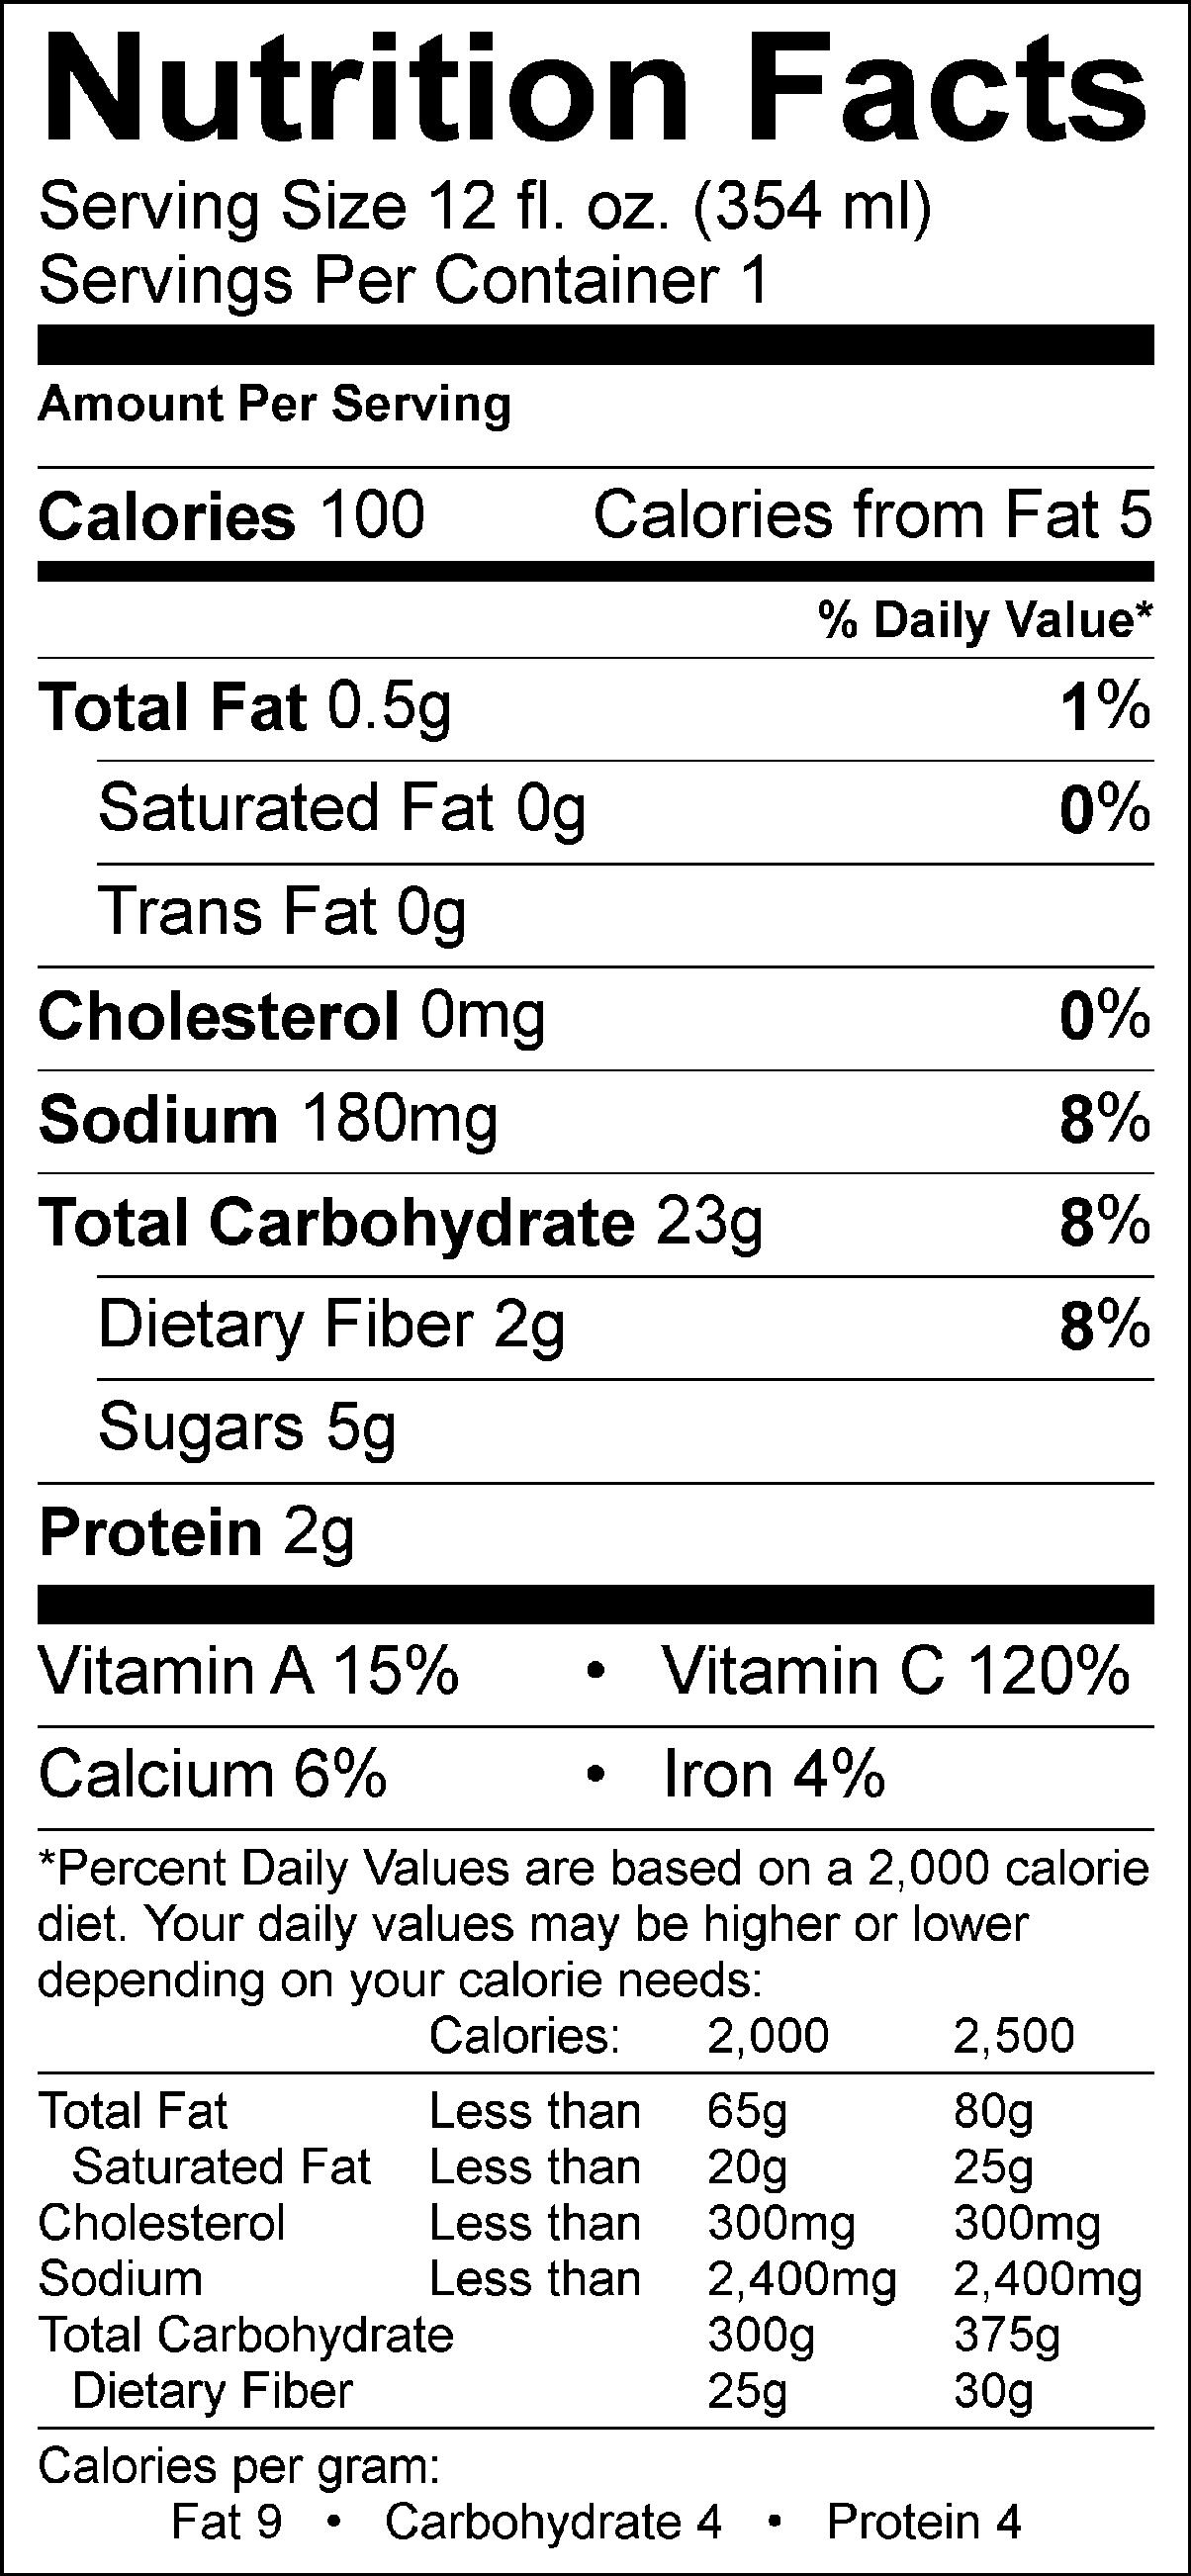 green-grapefruit-label-12-oz.png